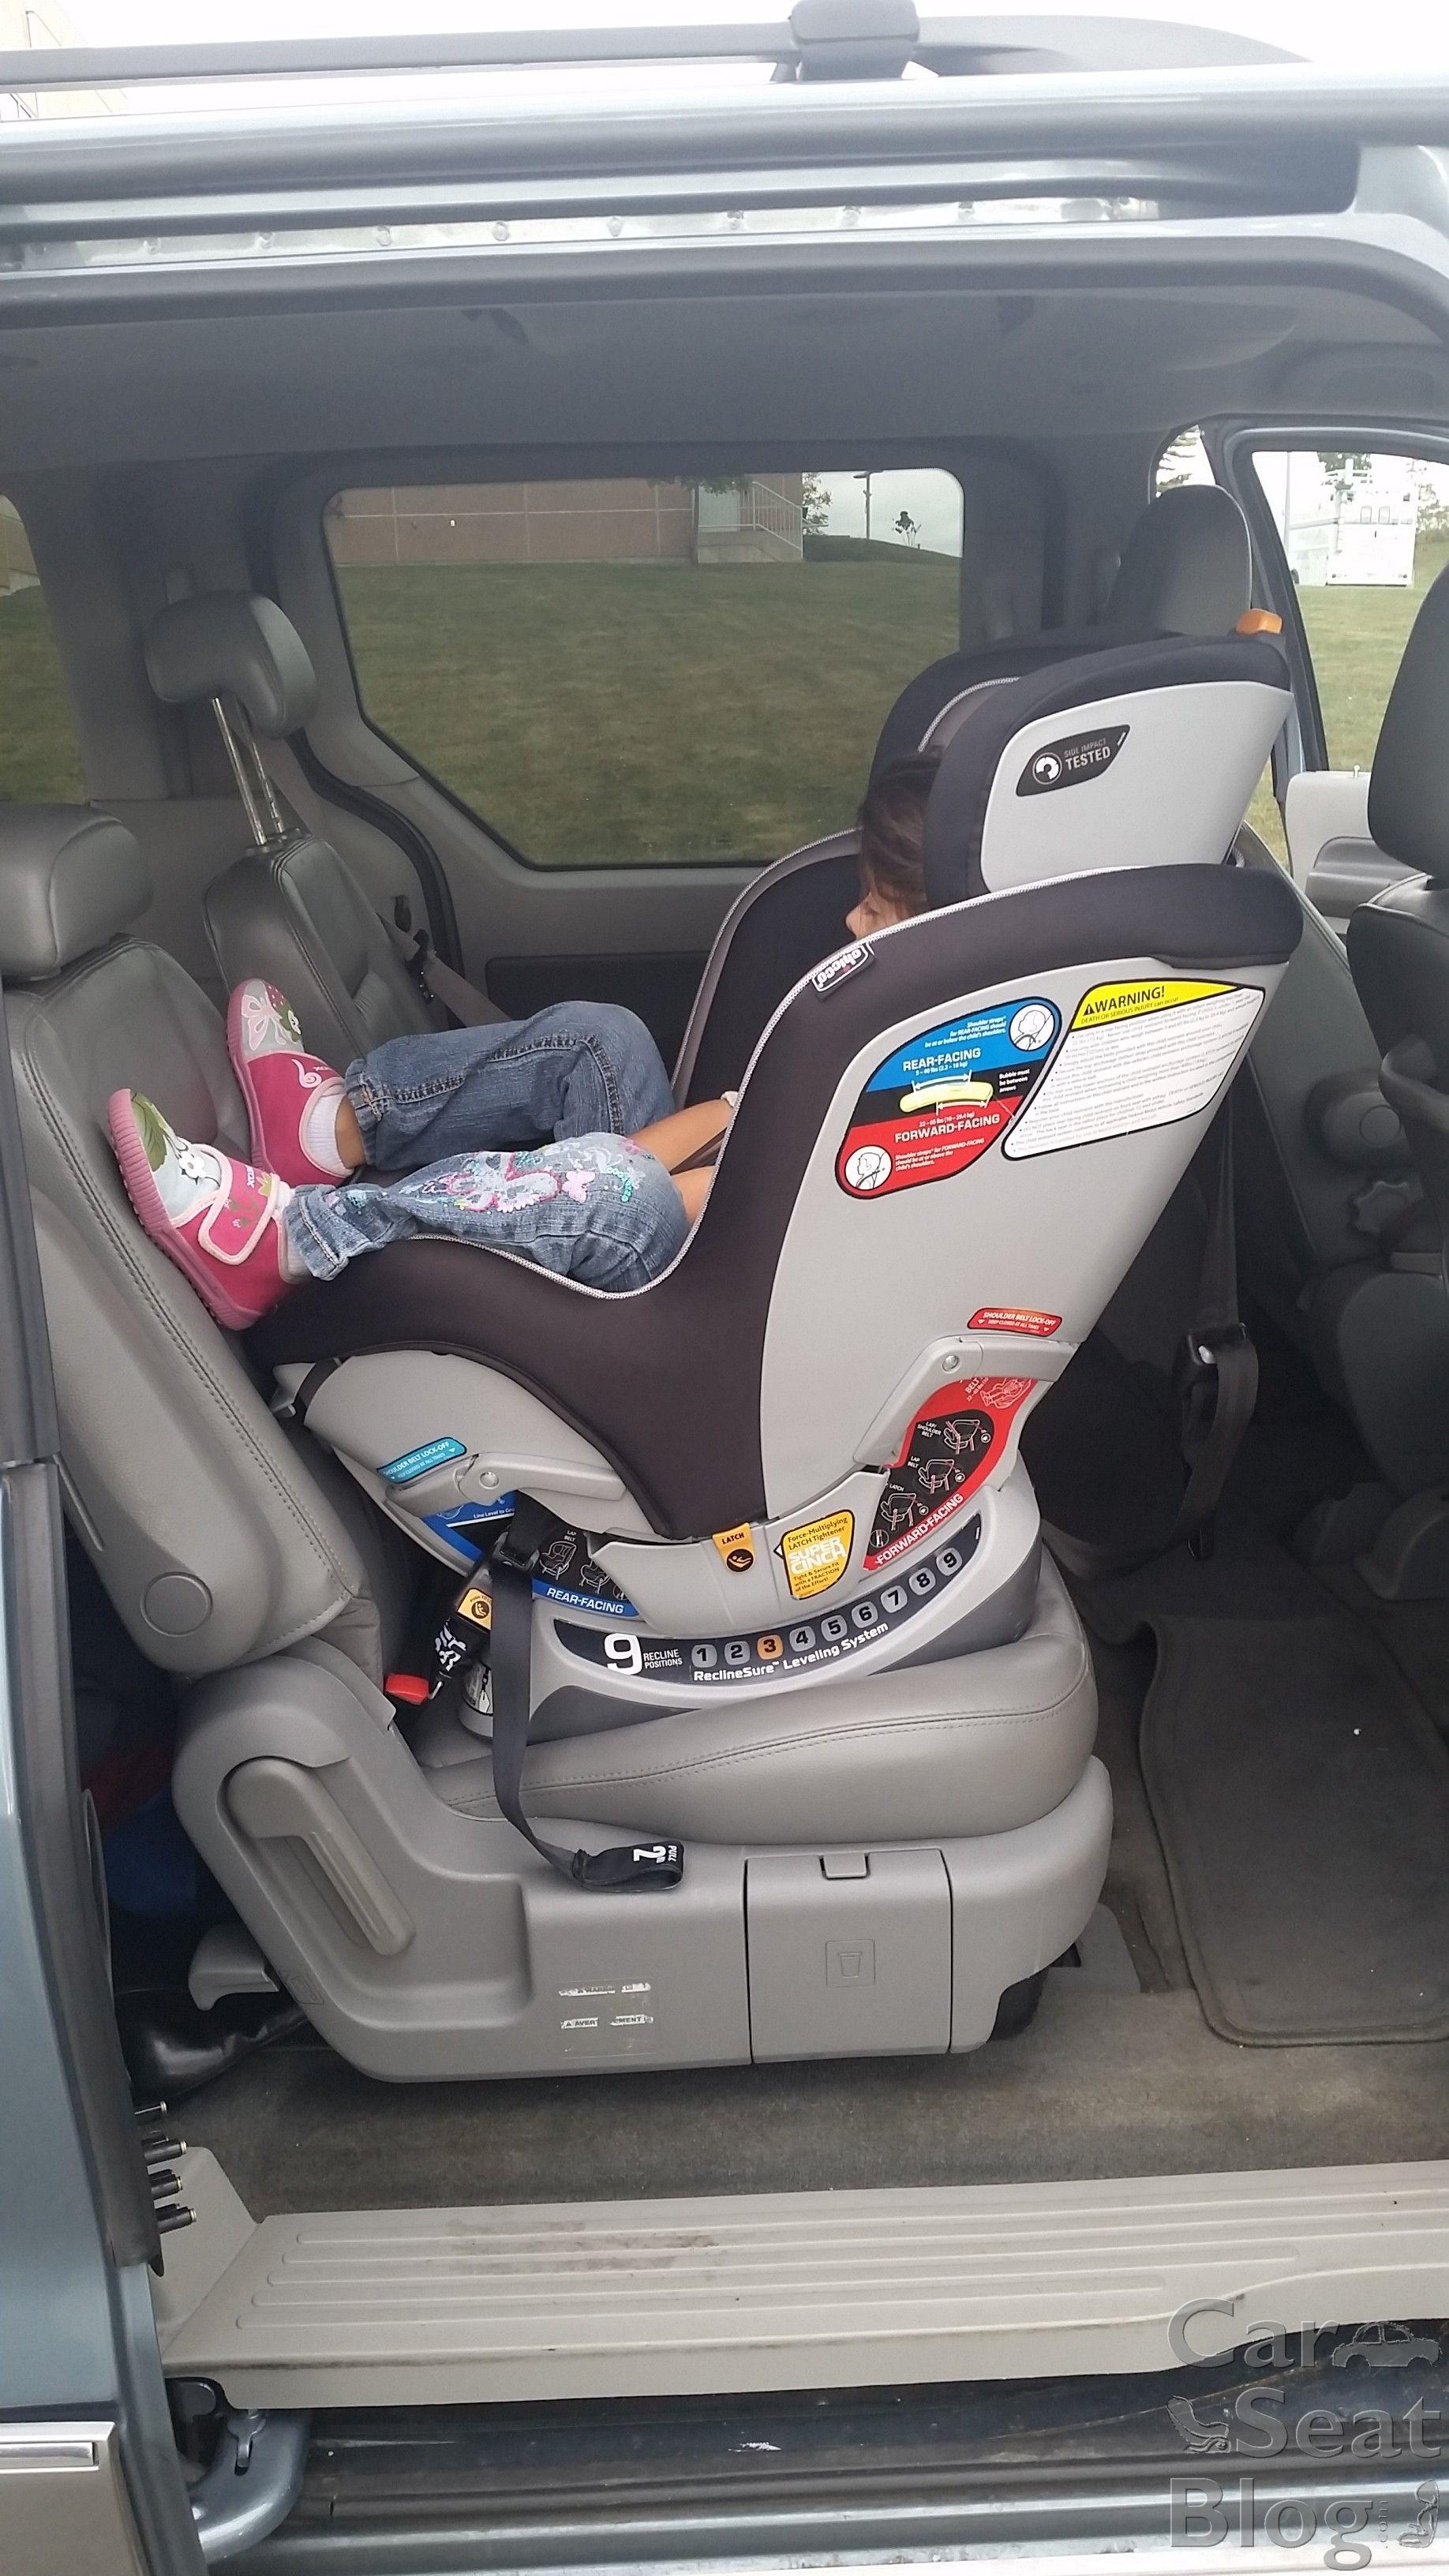 Convertible Car Seat Analysis Car Seat Reviews Extended Rear Facing Baby Car Seats